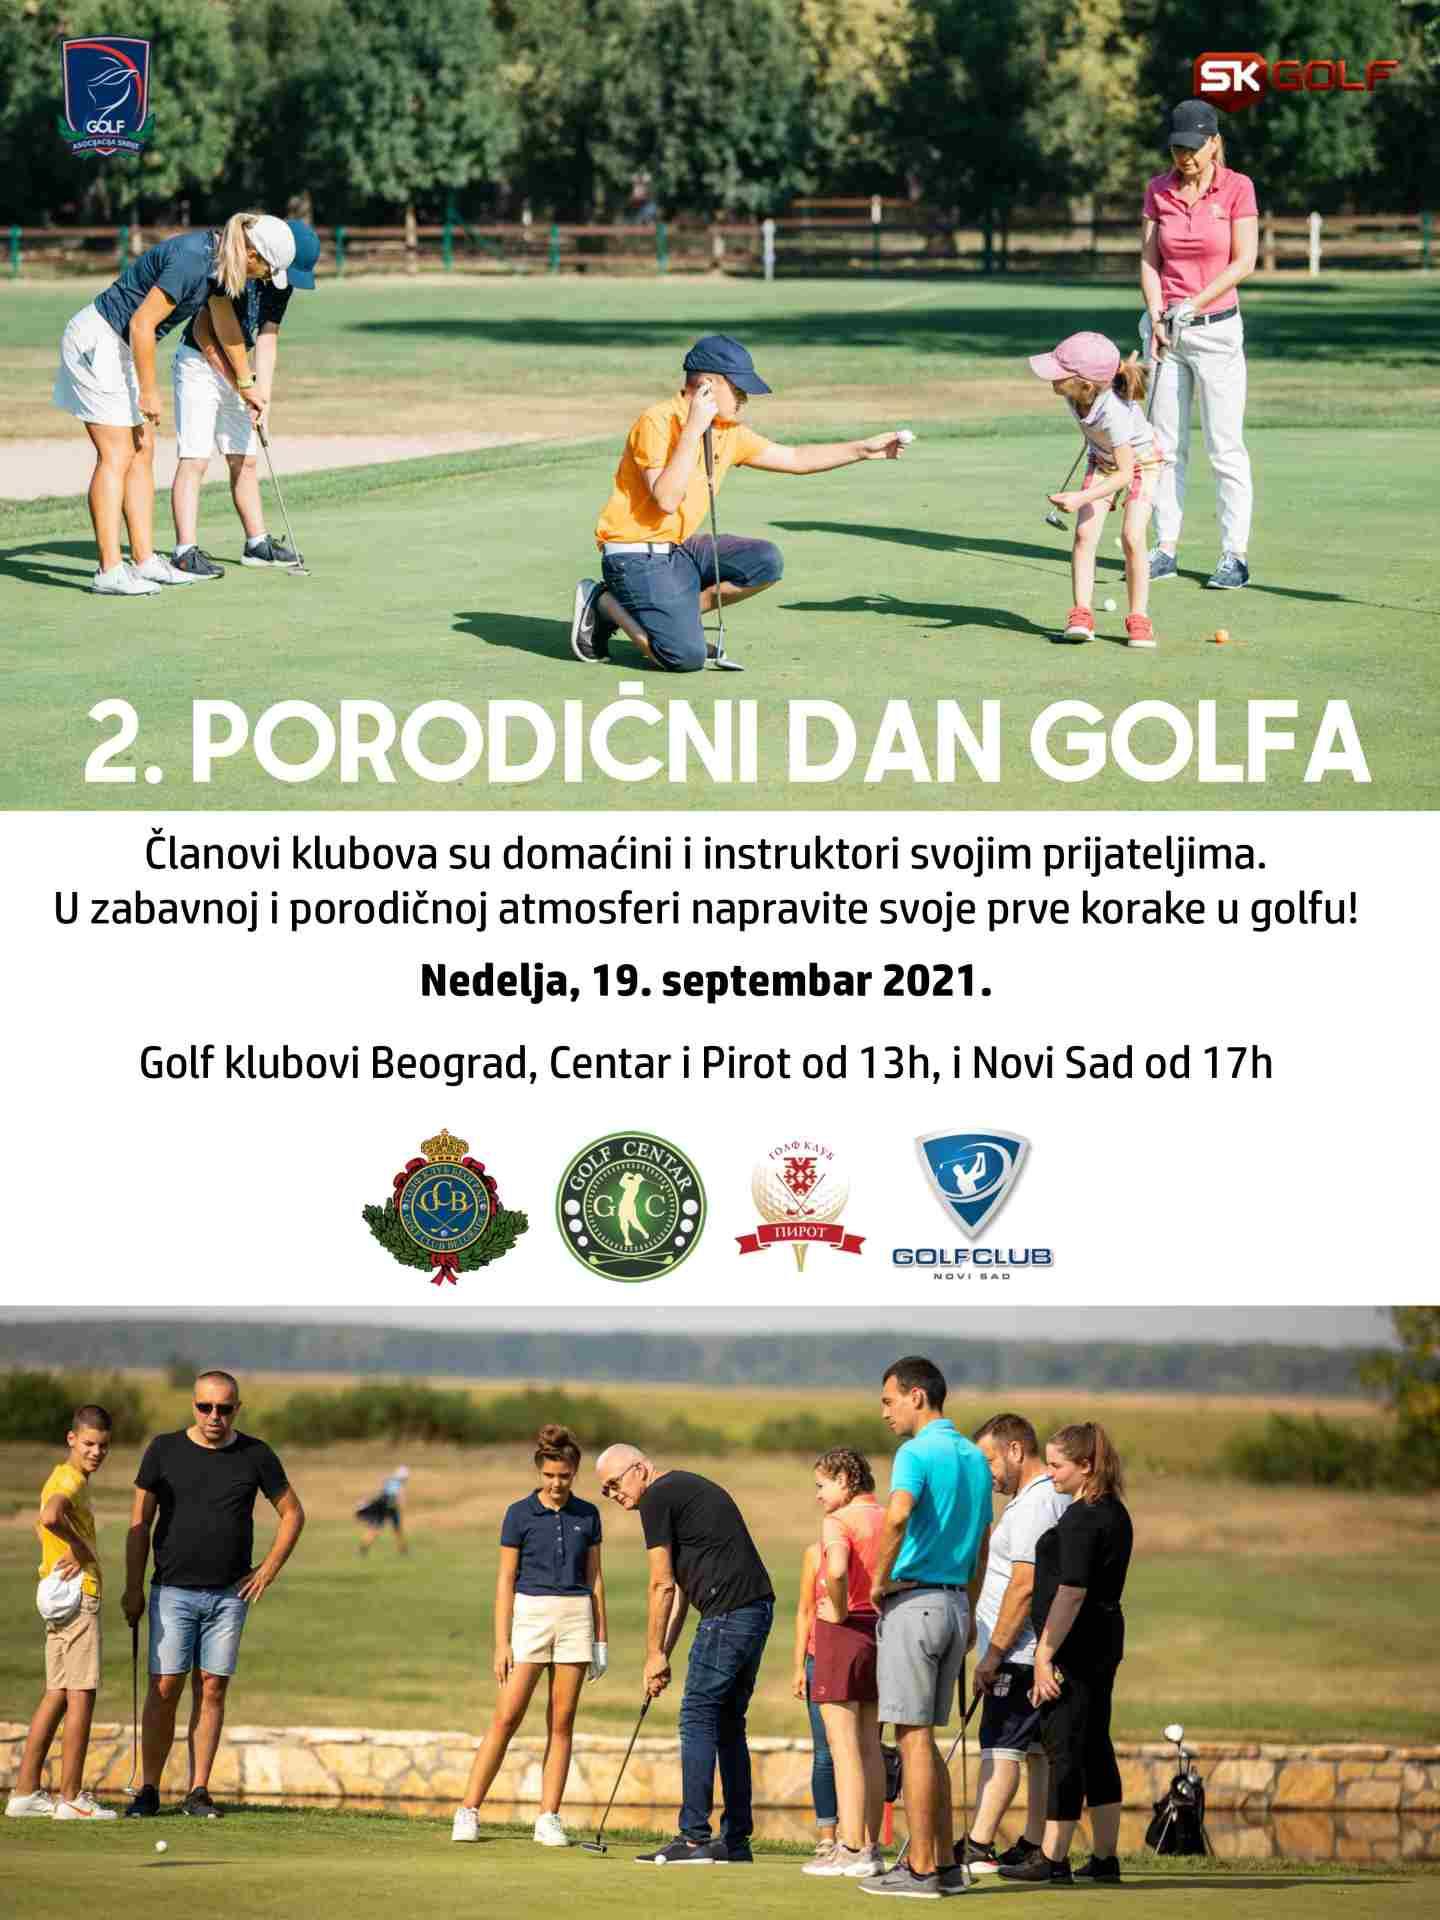 najava-porodični-dan-golfa 1